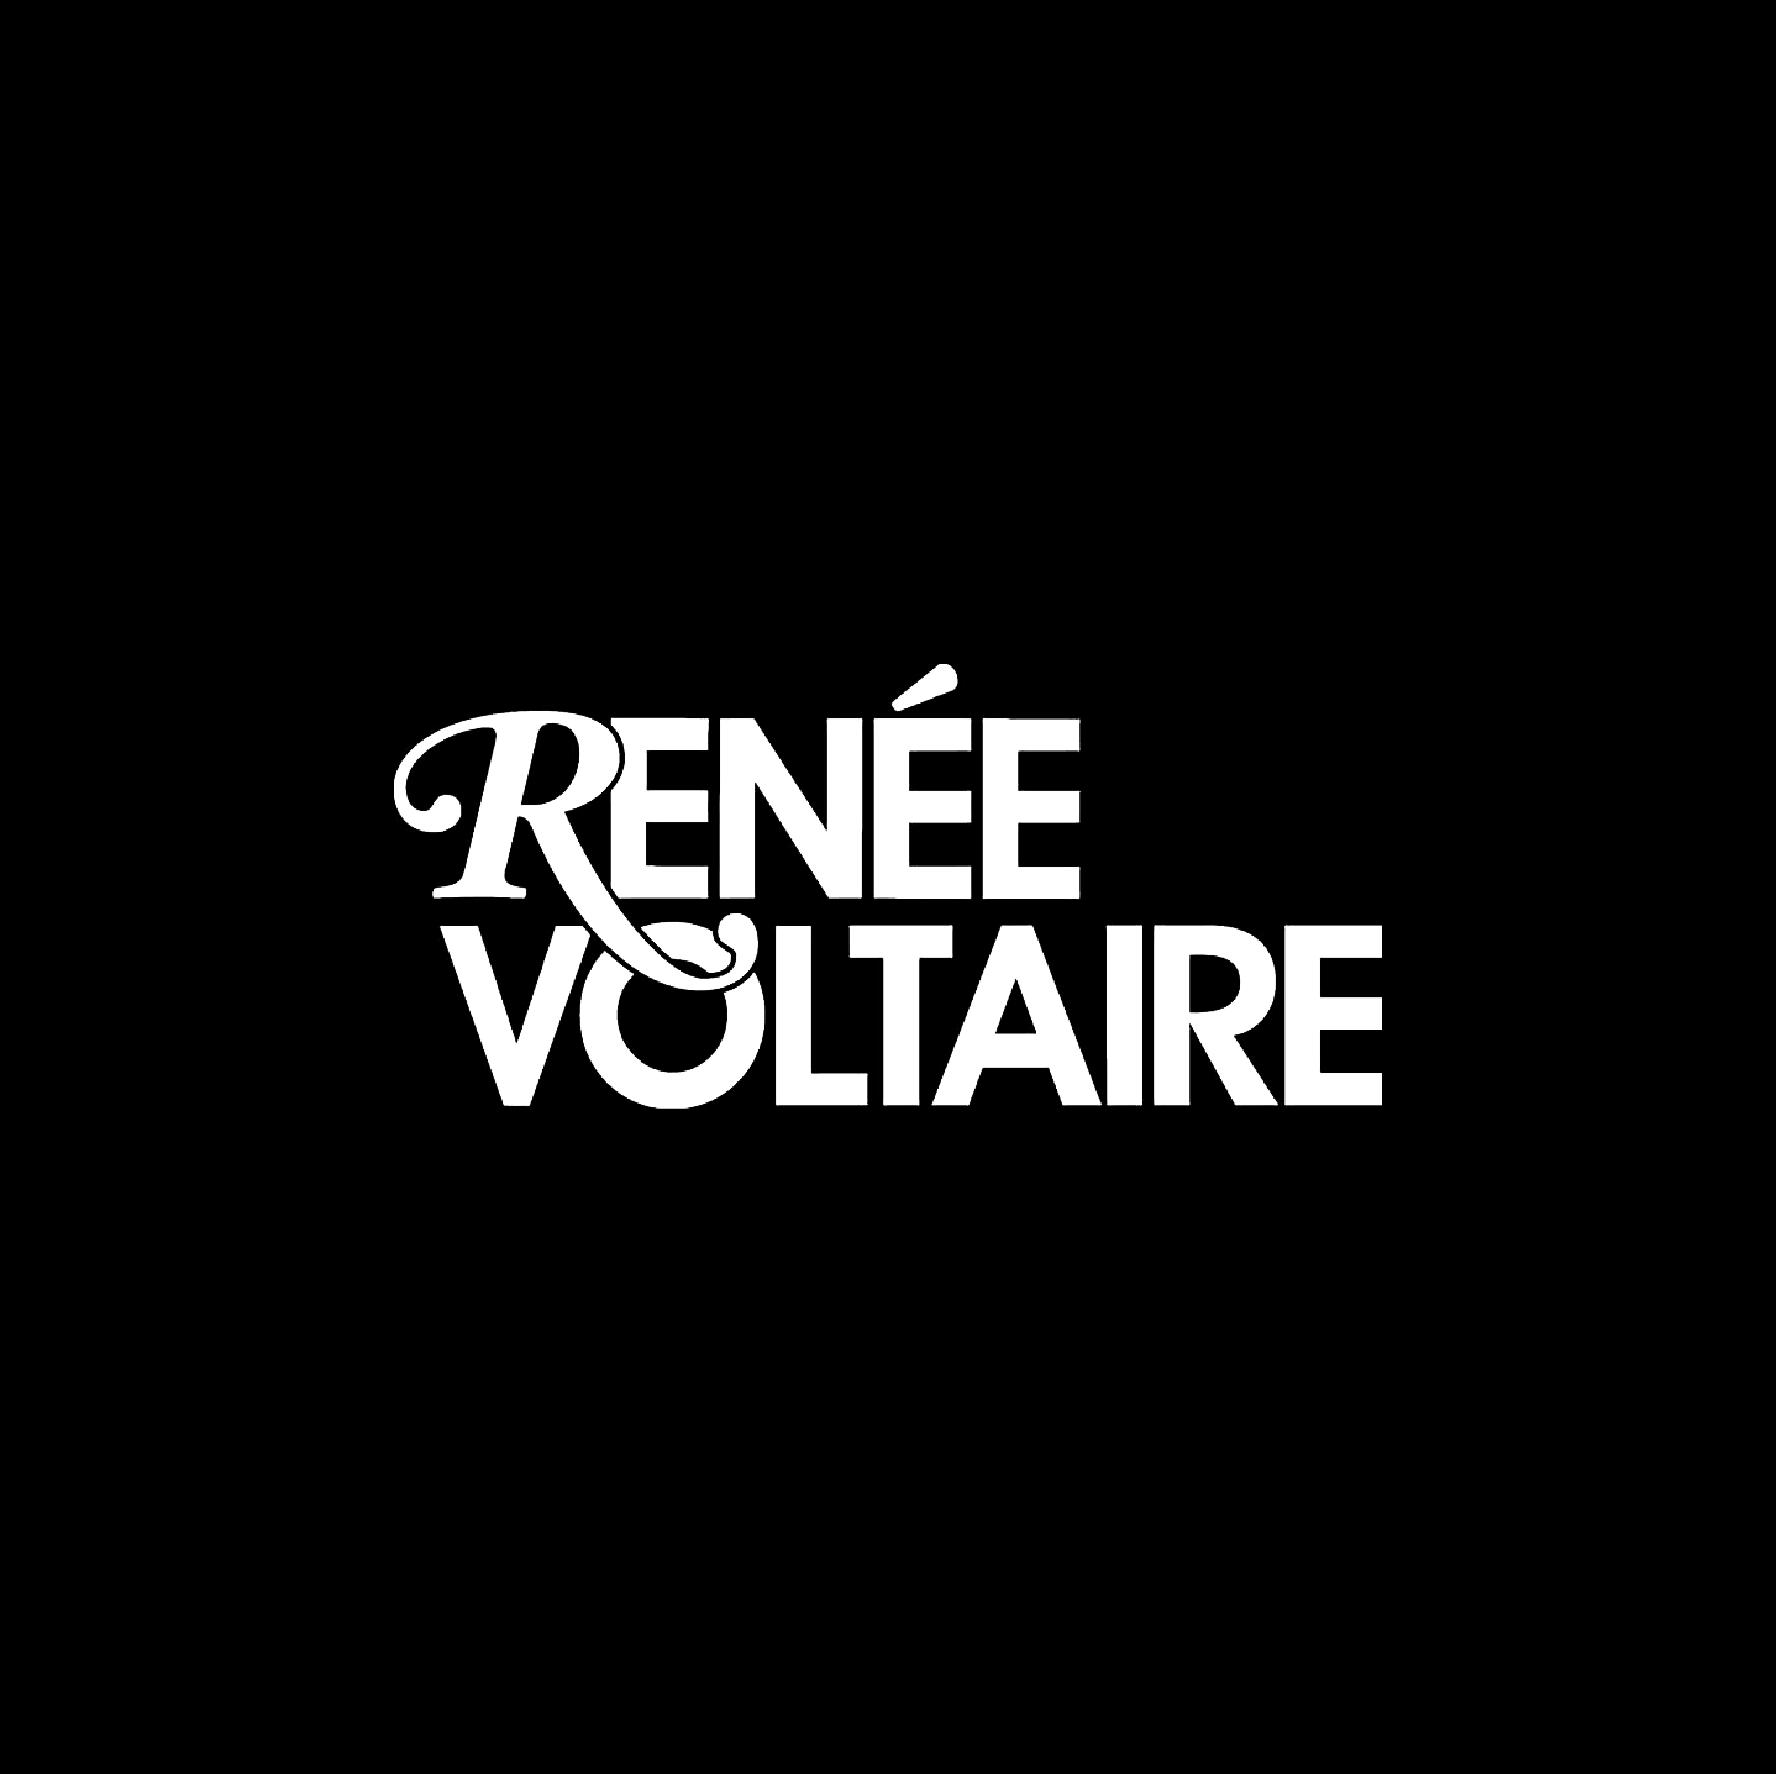 logo for Renée Voltaire